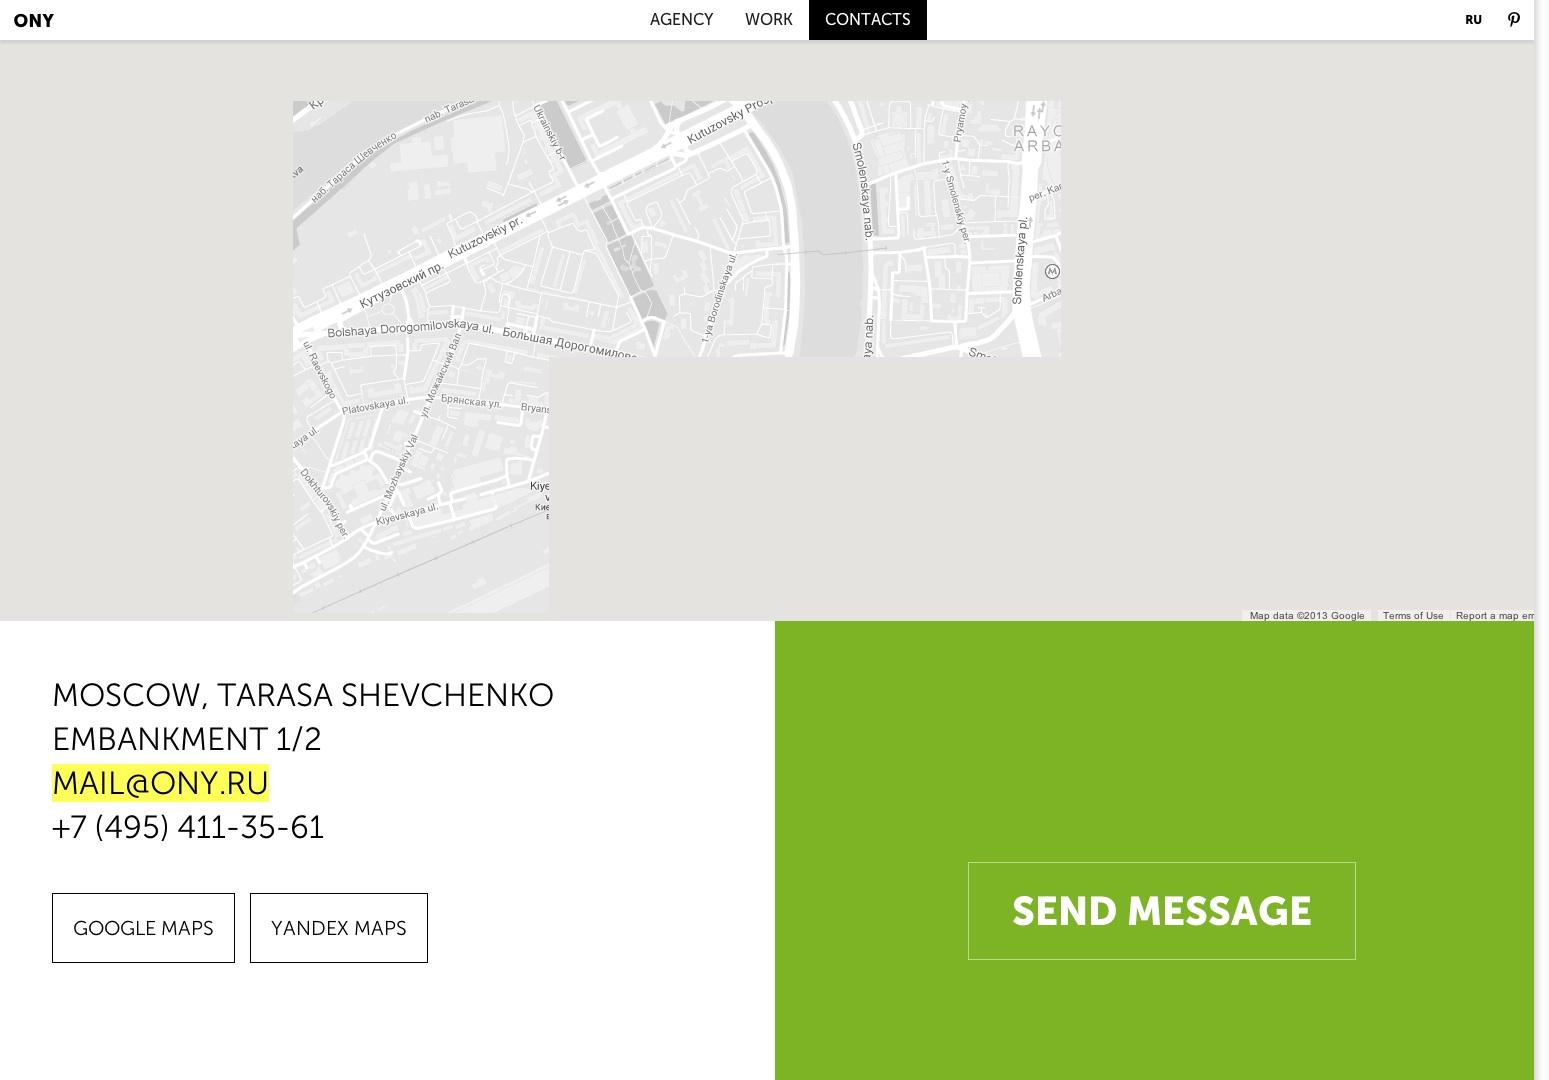 http---en.ony.ru-contacts (20131101)